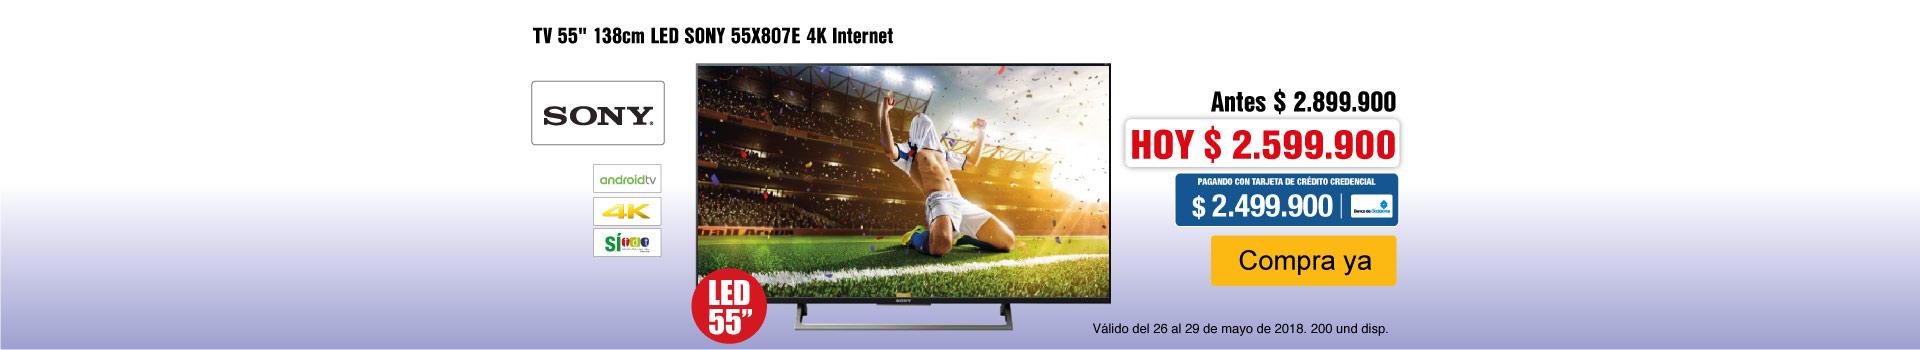 AK-KT-HIPER-1-TV-SONY-55X807-mayo-26